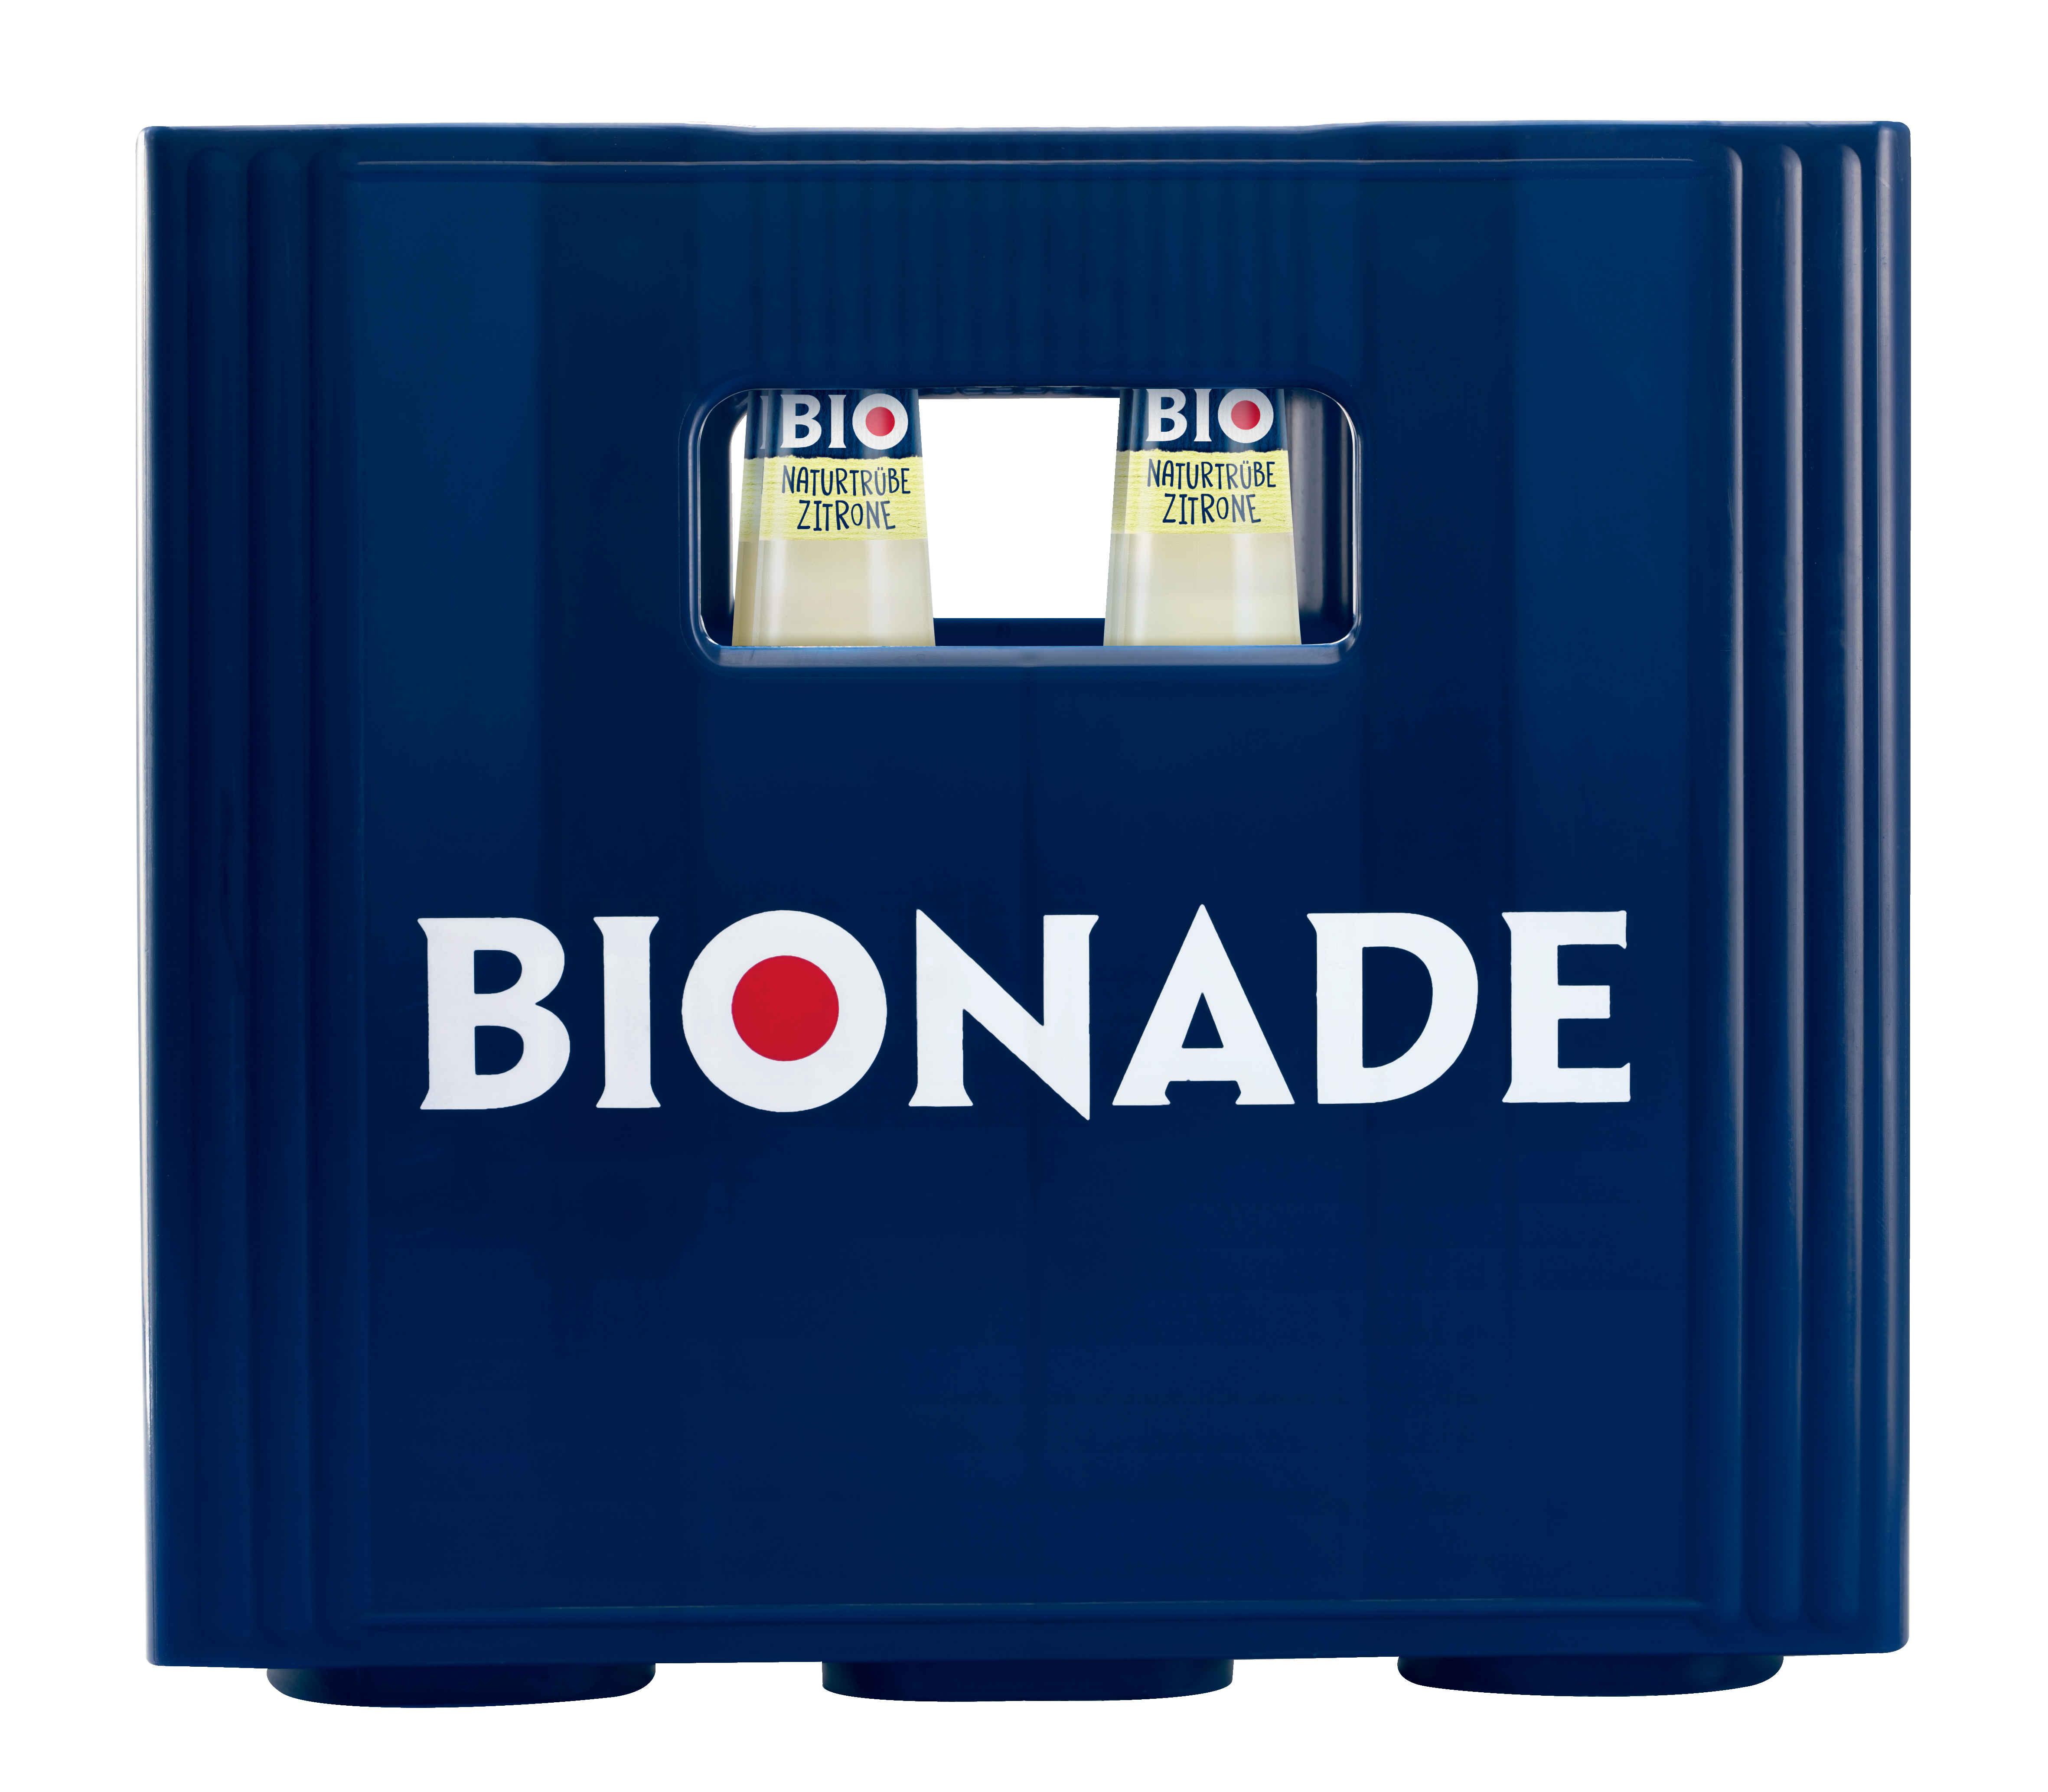 Bionade Naturtrübe Zitrone 12x0,33l Mehrweg Glas